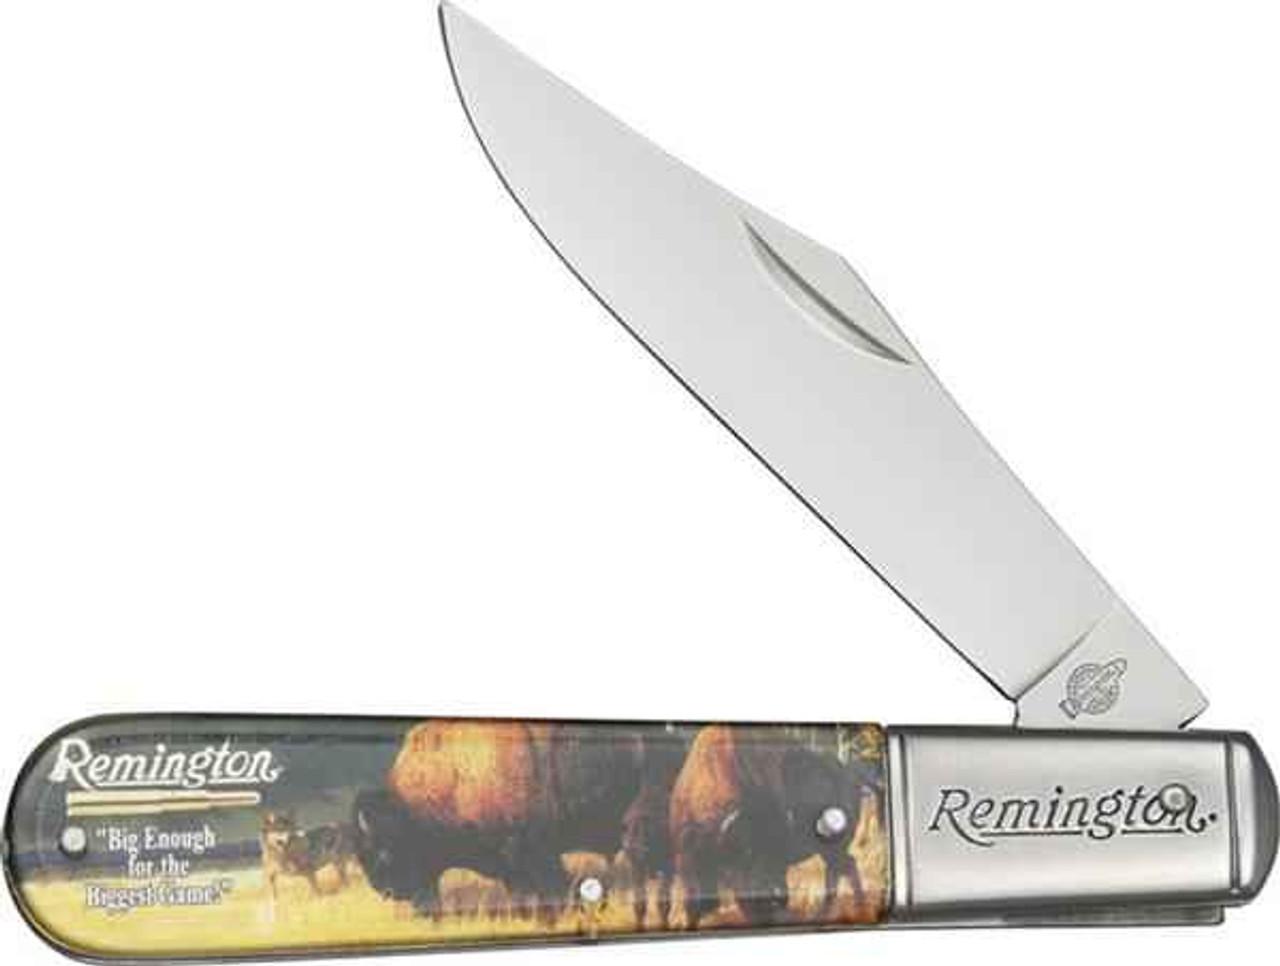 Remington Large Barlow, Standoff - Big Enough for the Biggest Game